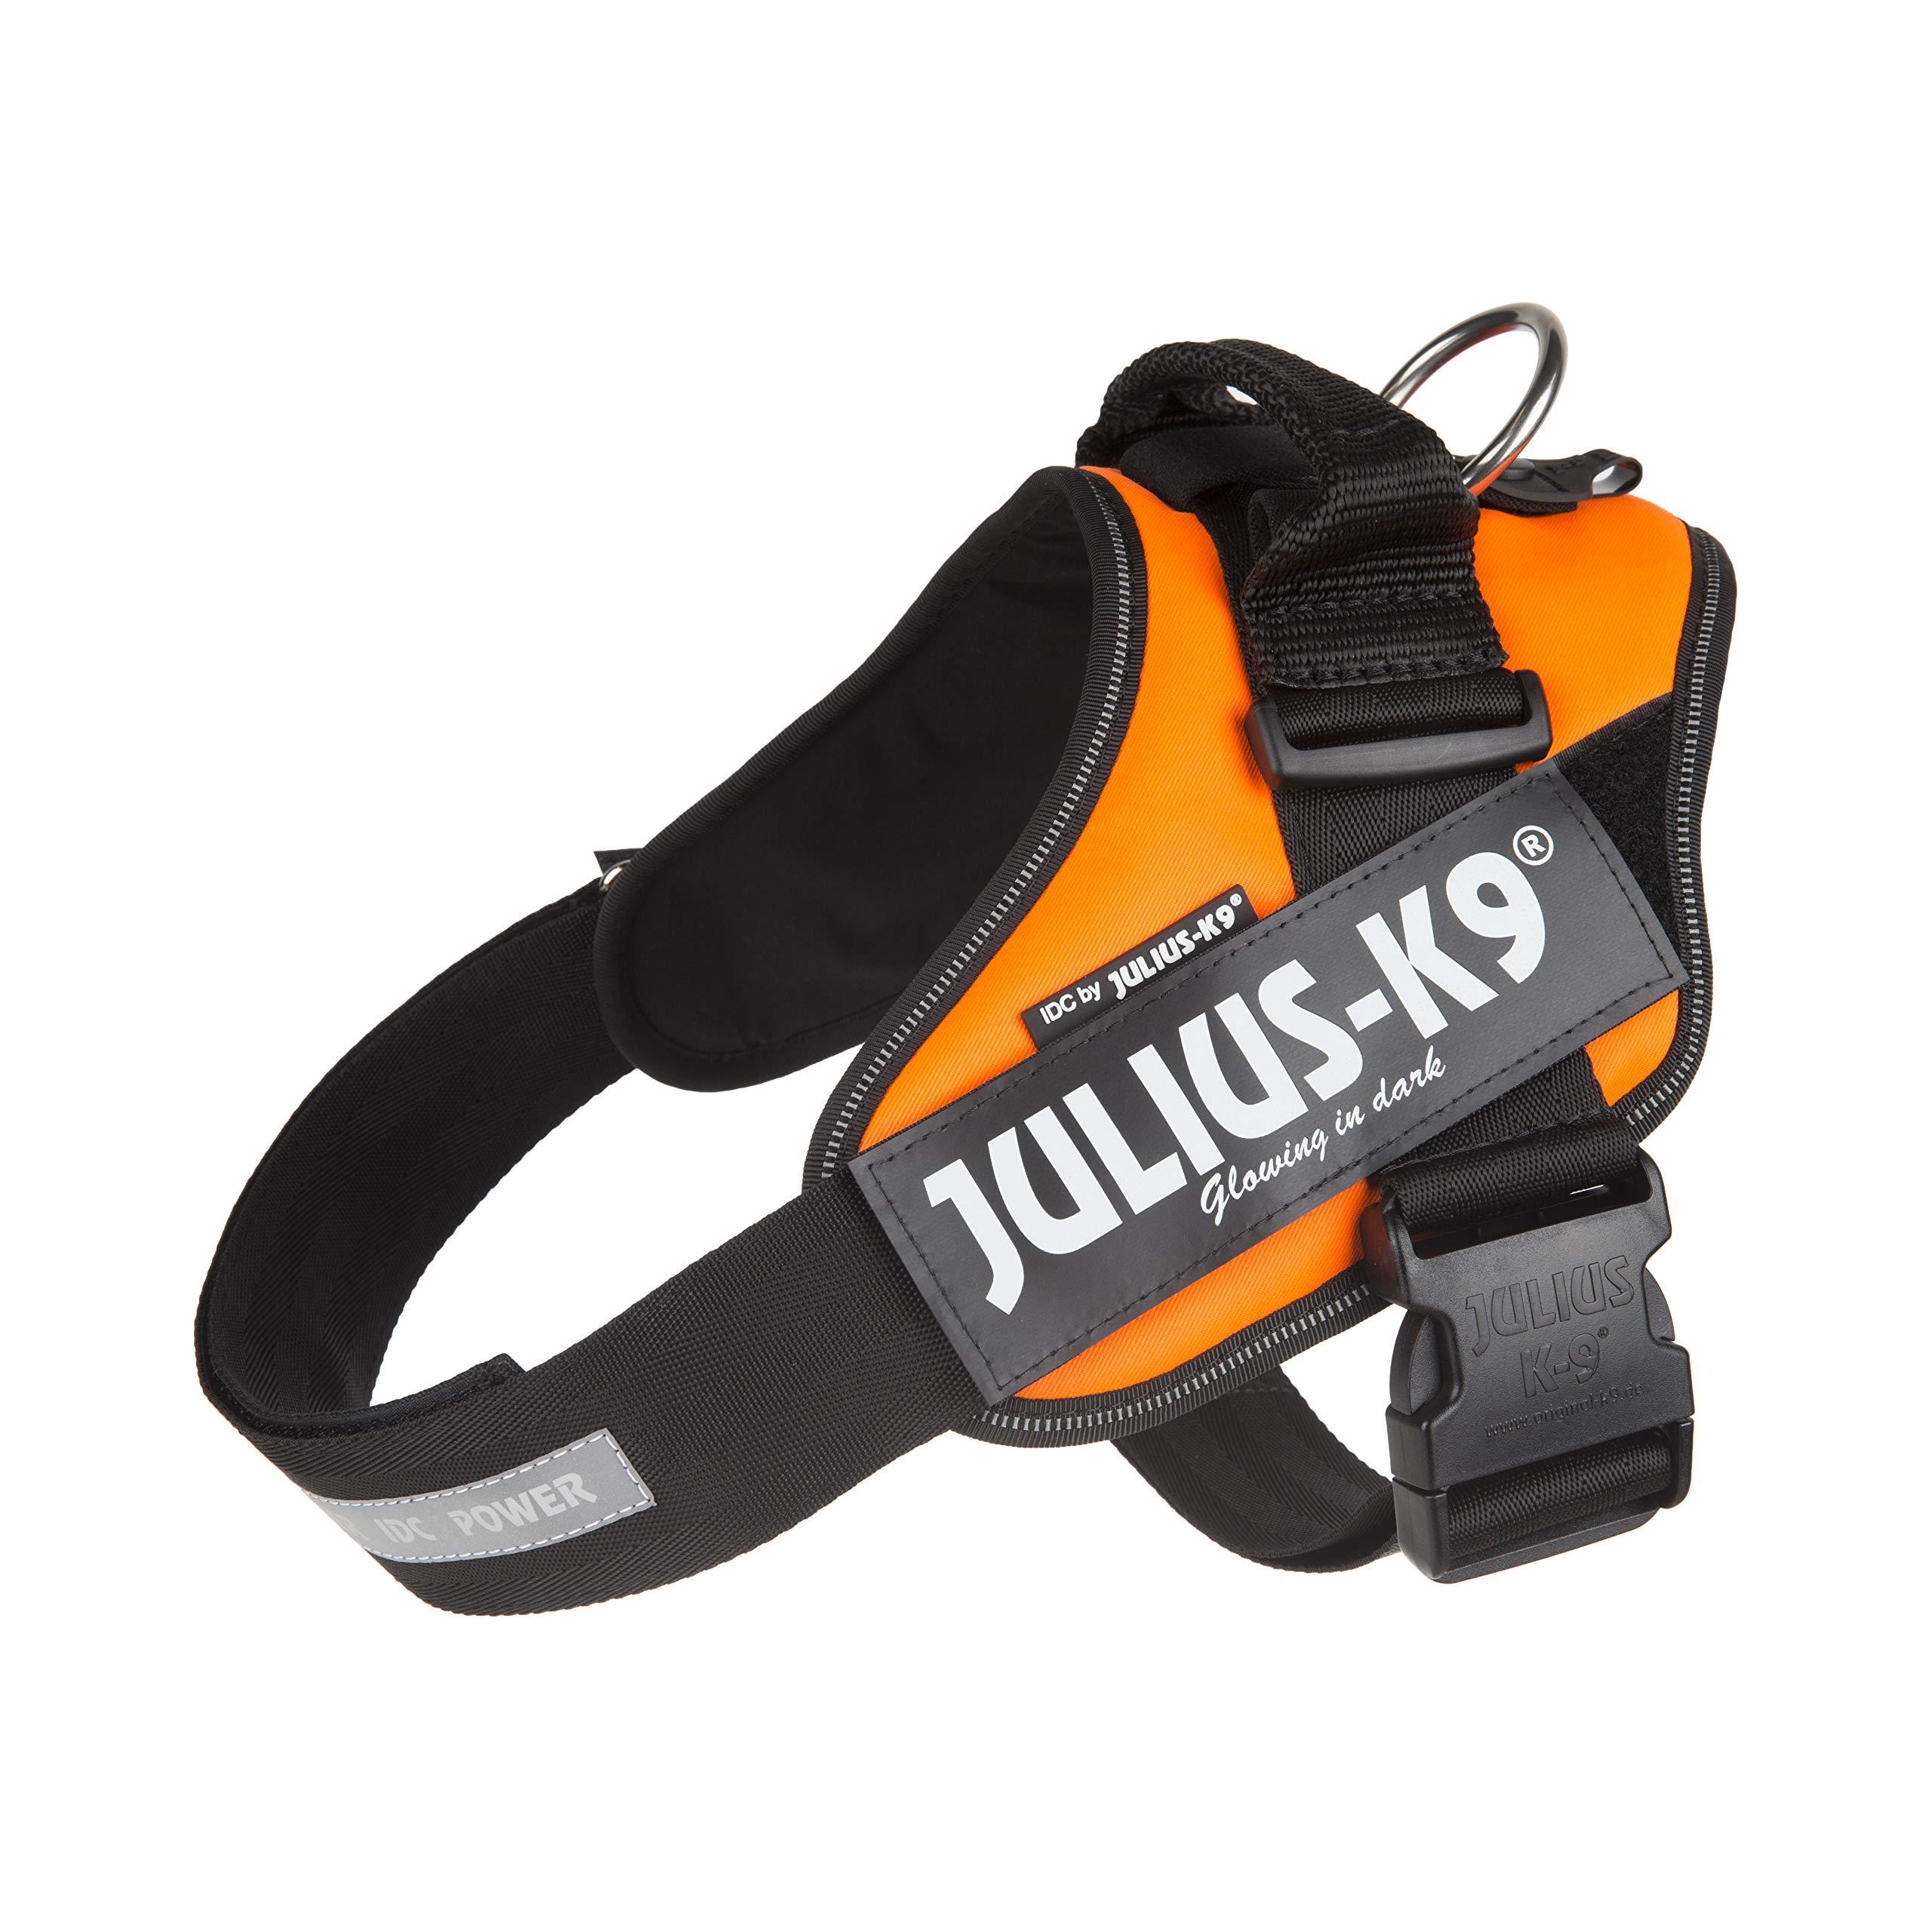 Julius-K9 IDC-Power Lumino Harnais pour Chien Orange Fluo Taille Baby 1